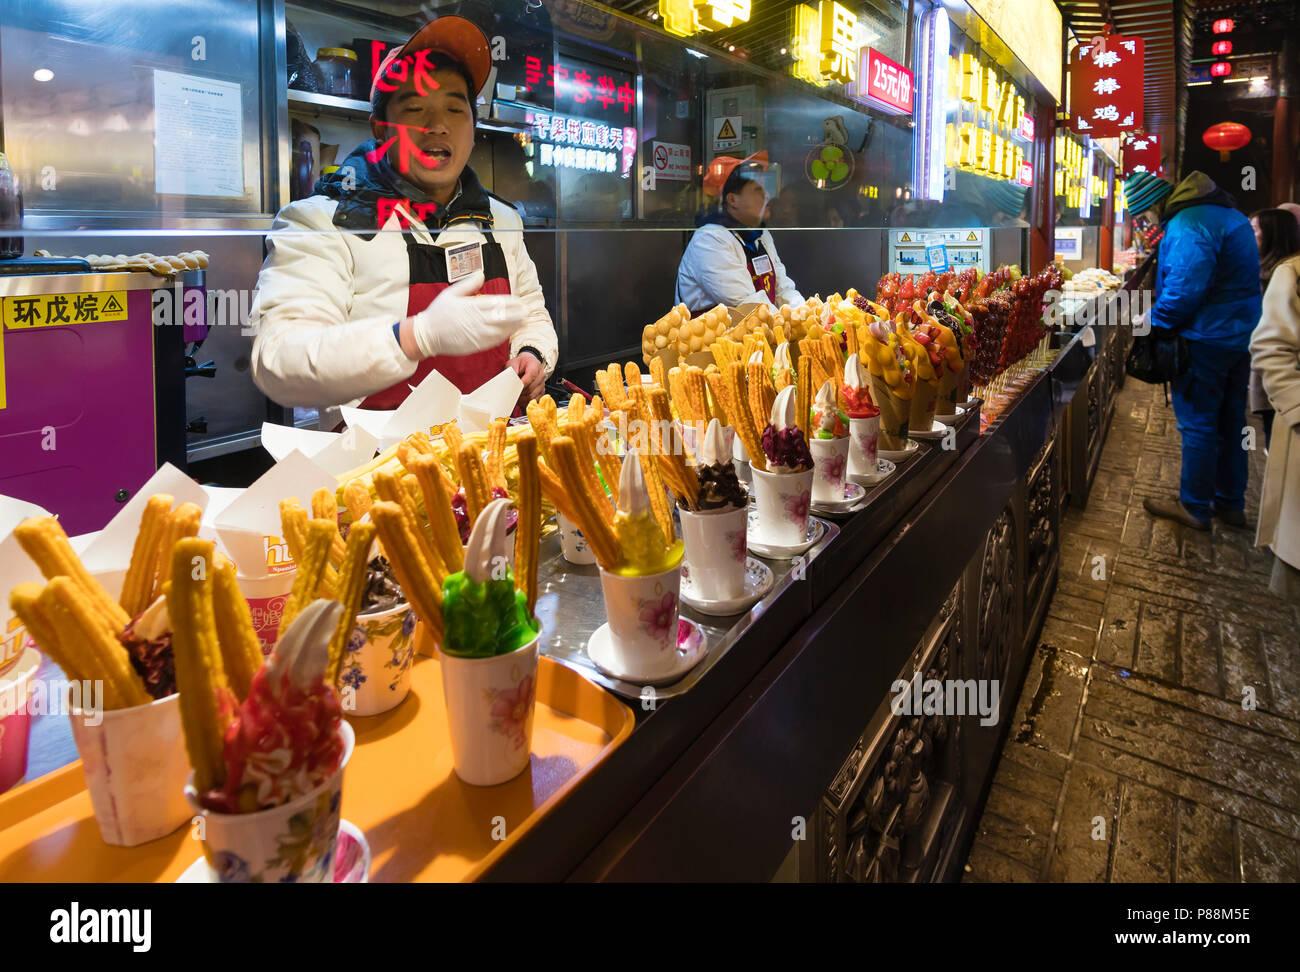 People at the Wangfujing Snack Street in Beijing - Stock Image